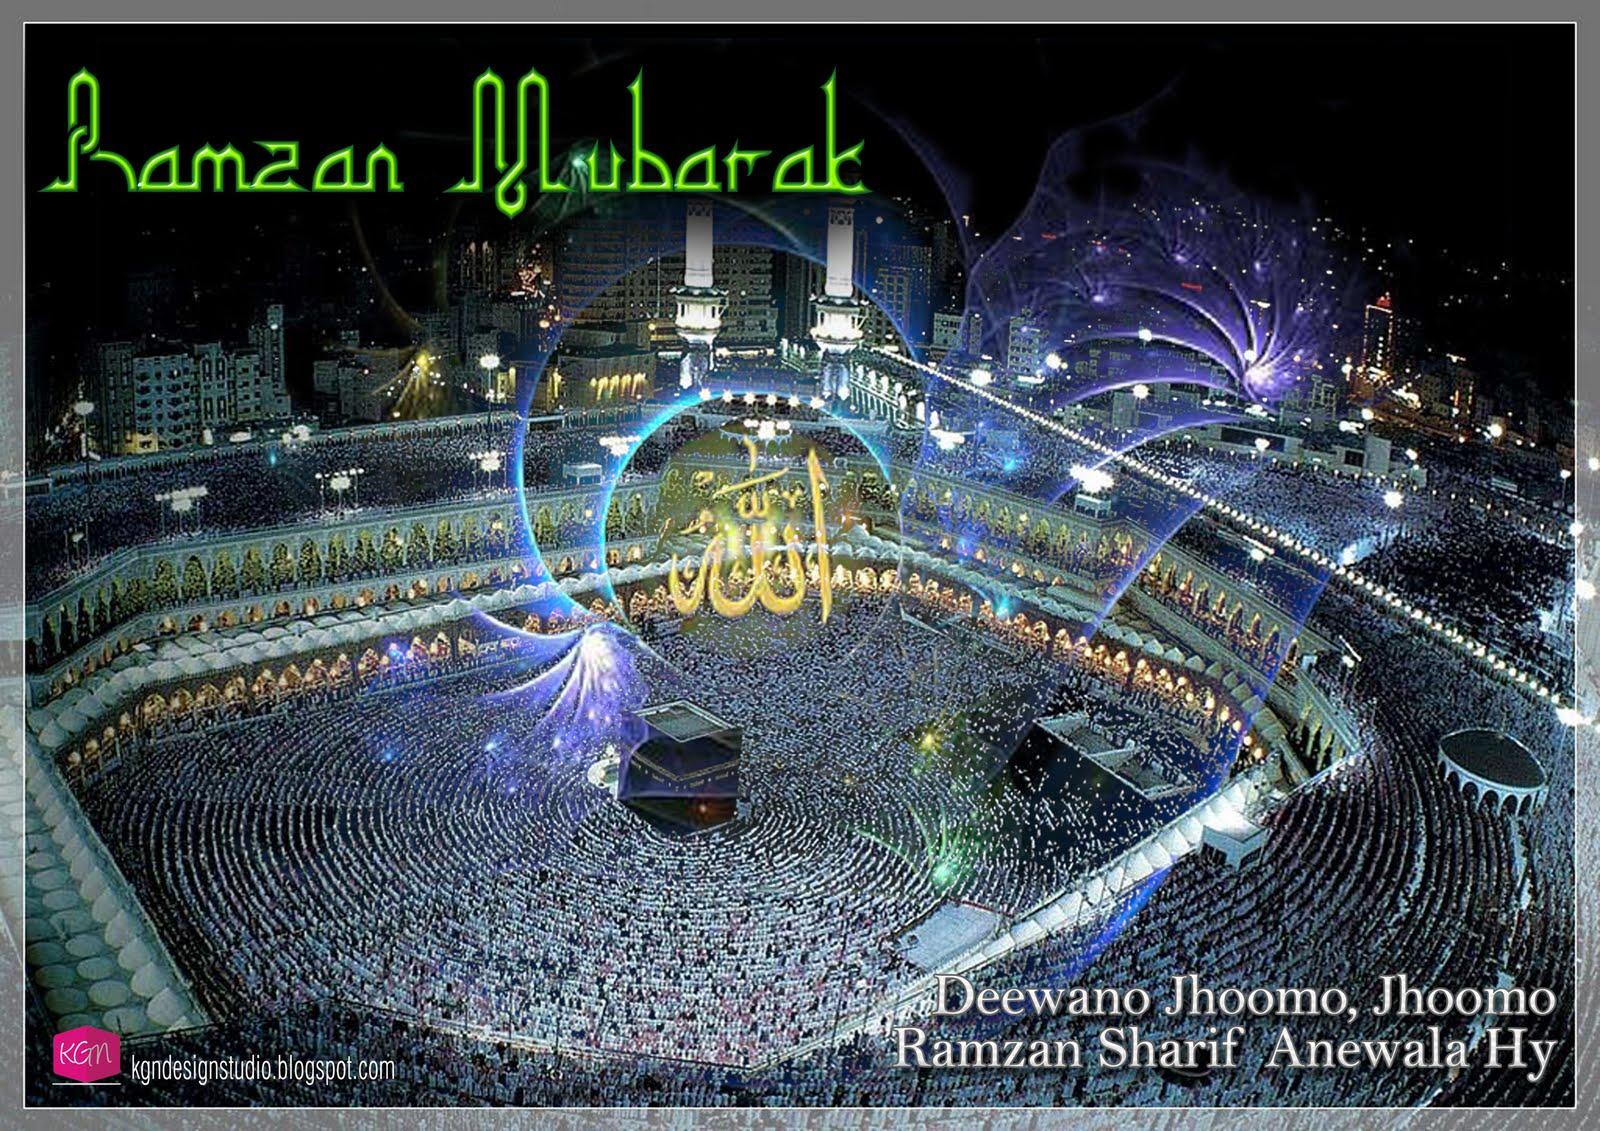 http://2.bp.blogspot.com/-Cd0sIOOKU18/TifT_SSQj6I/AAAAAAAAADw/Qcz2qdPFNms/s1600/Ramdhan+Wallpaper-01+copy.jpg